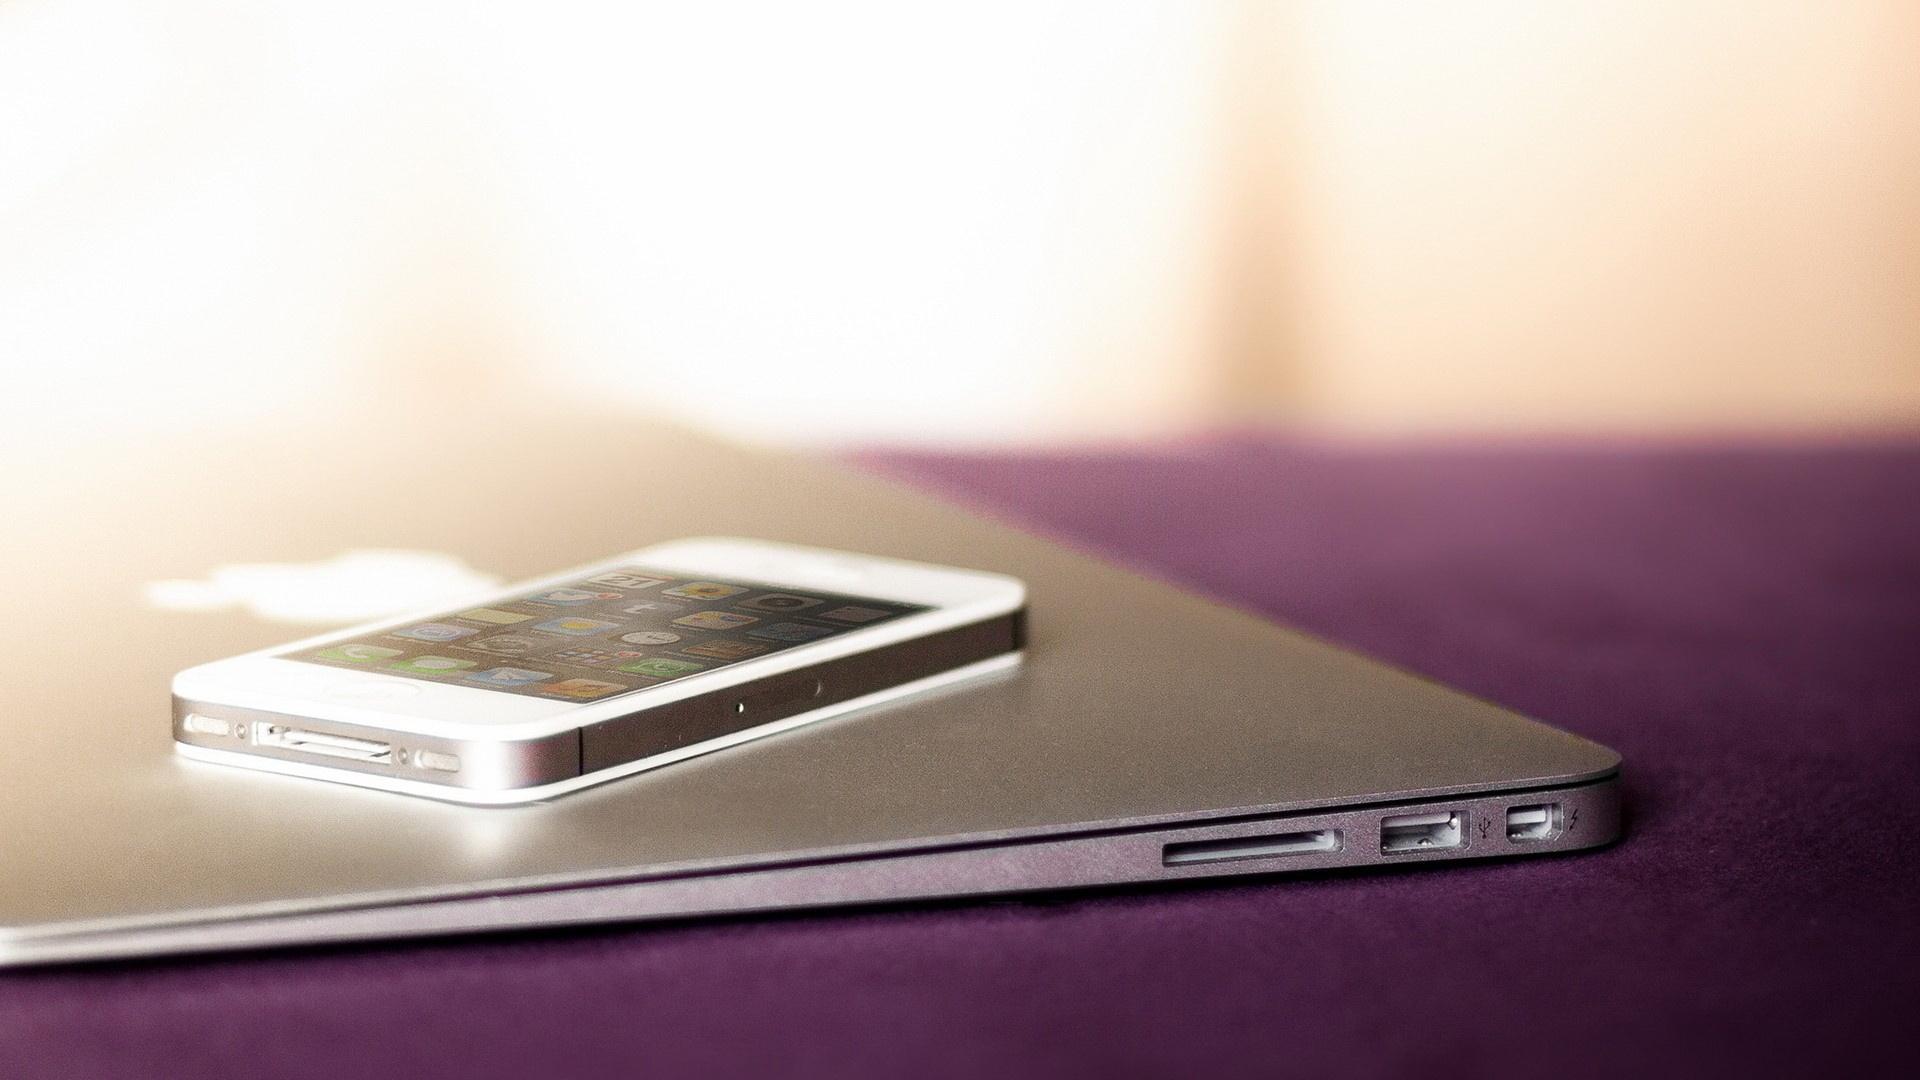 Download Wallpaper 1920x1080 Iphone 5 Macbook Apple Full